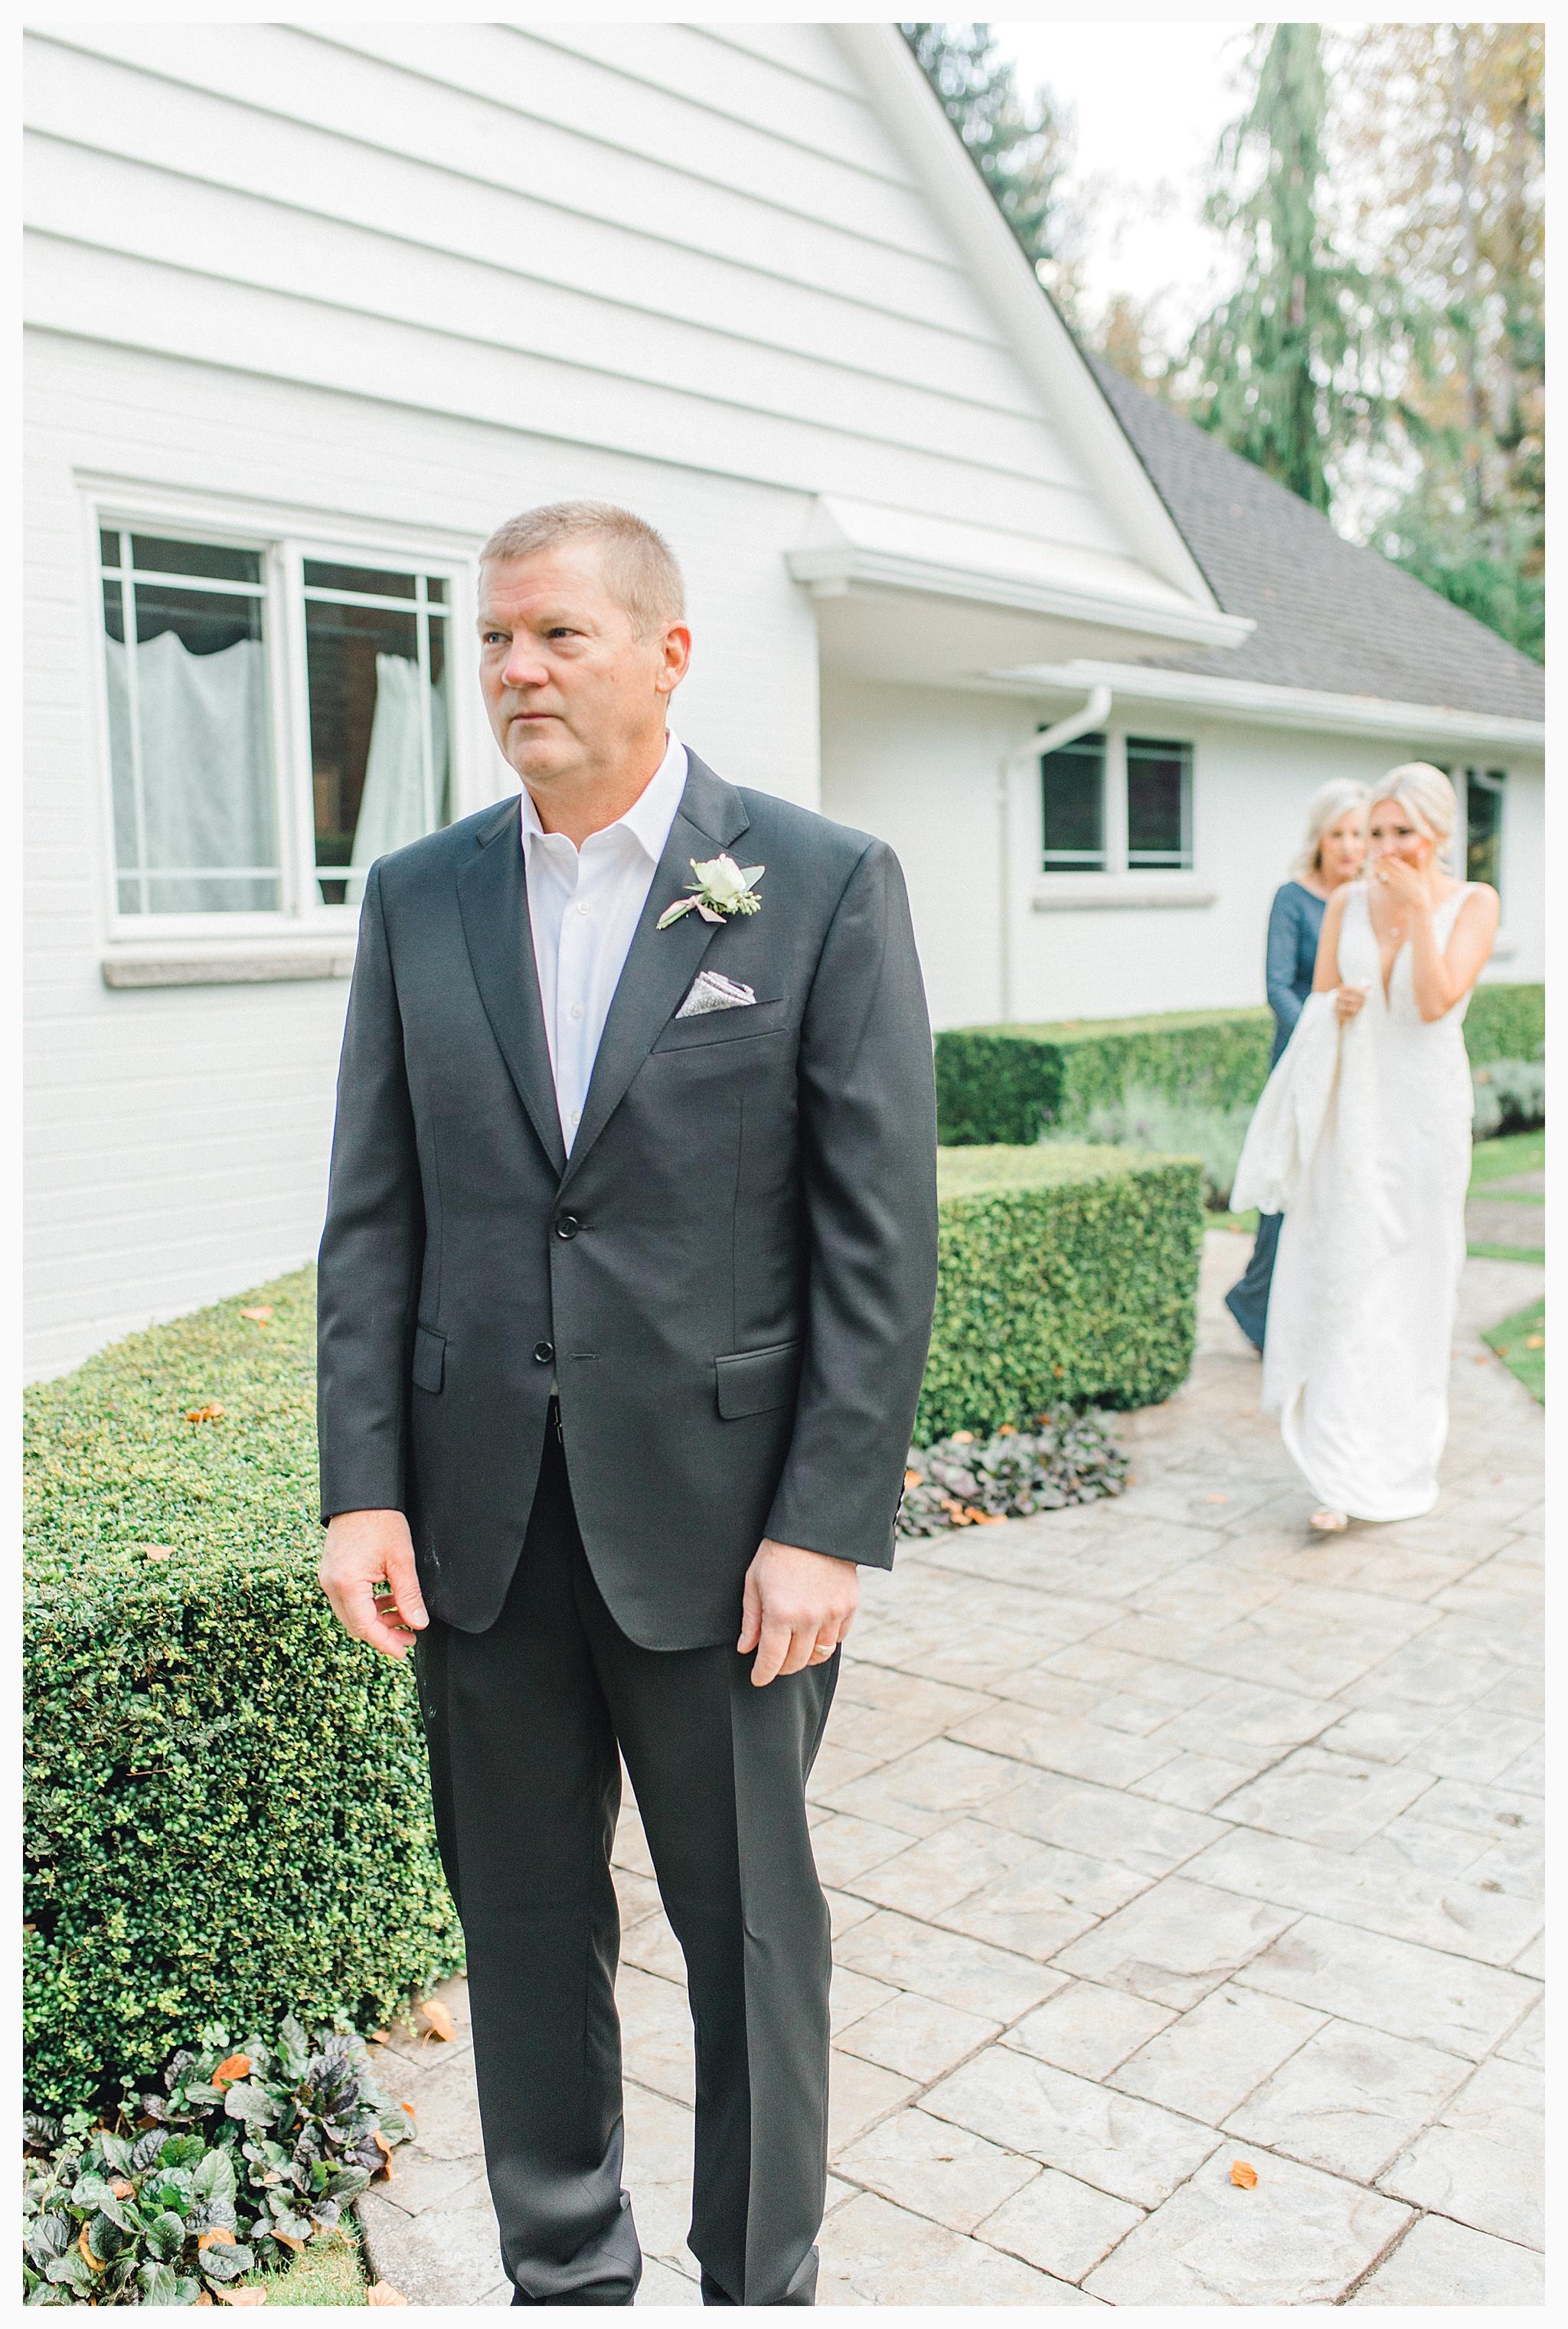 Emma Rose Company Light and Airy Wedding Photographer, Beautiful fall wedding at Rock Creek Gardens Venue in Puyallup, Washington._0018.jpg